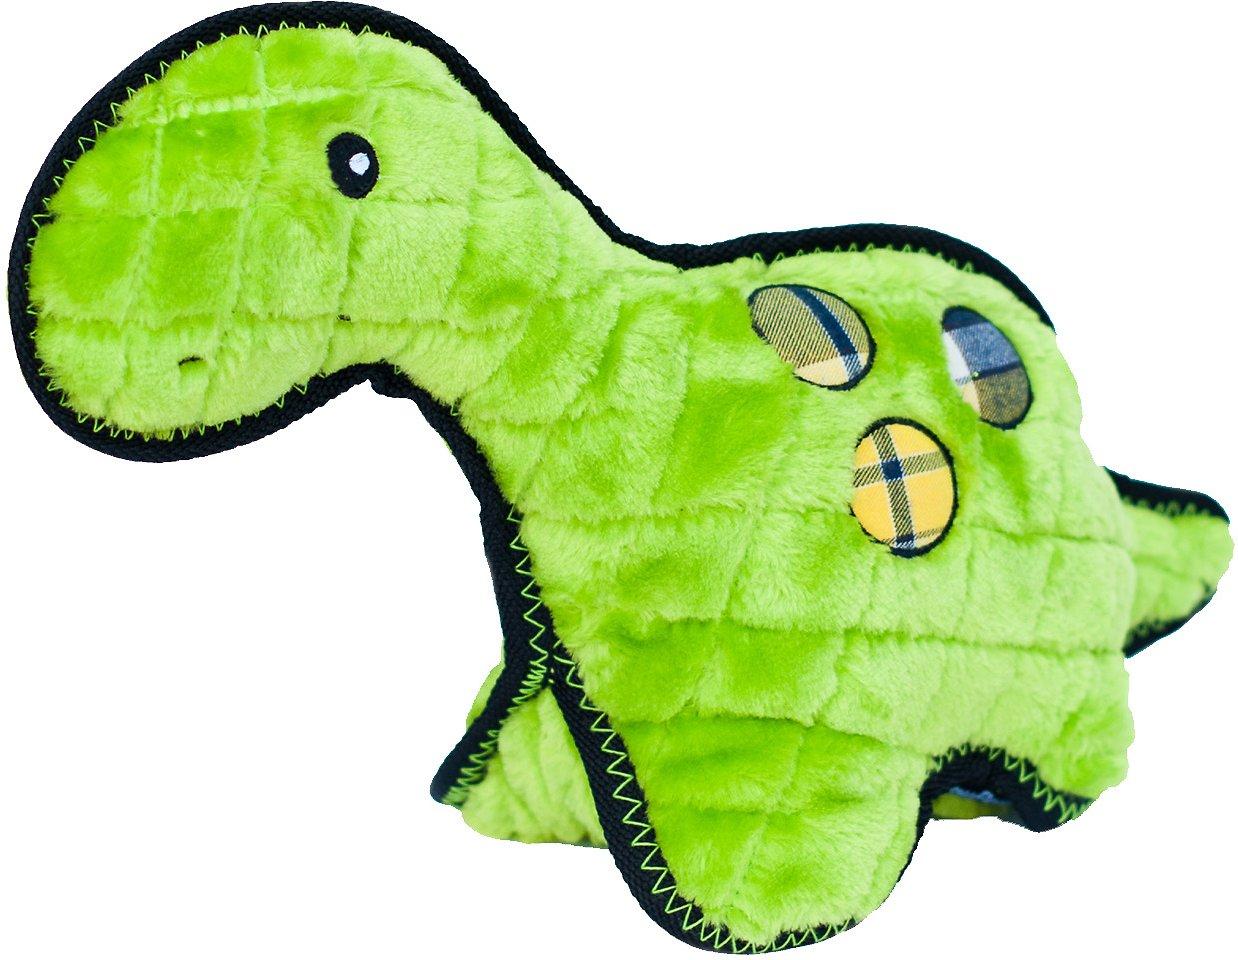 ZippyPaws Z-Stitch Grunterz Donny the Dinosaur Dog Toy